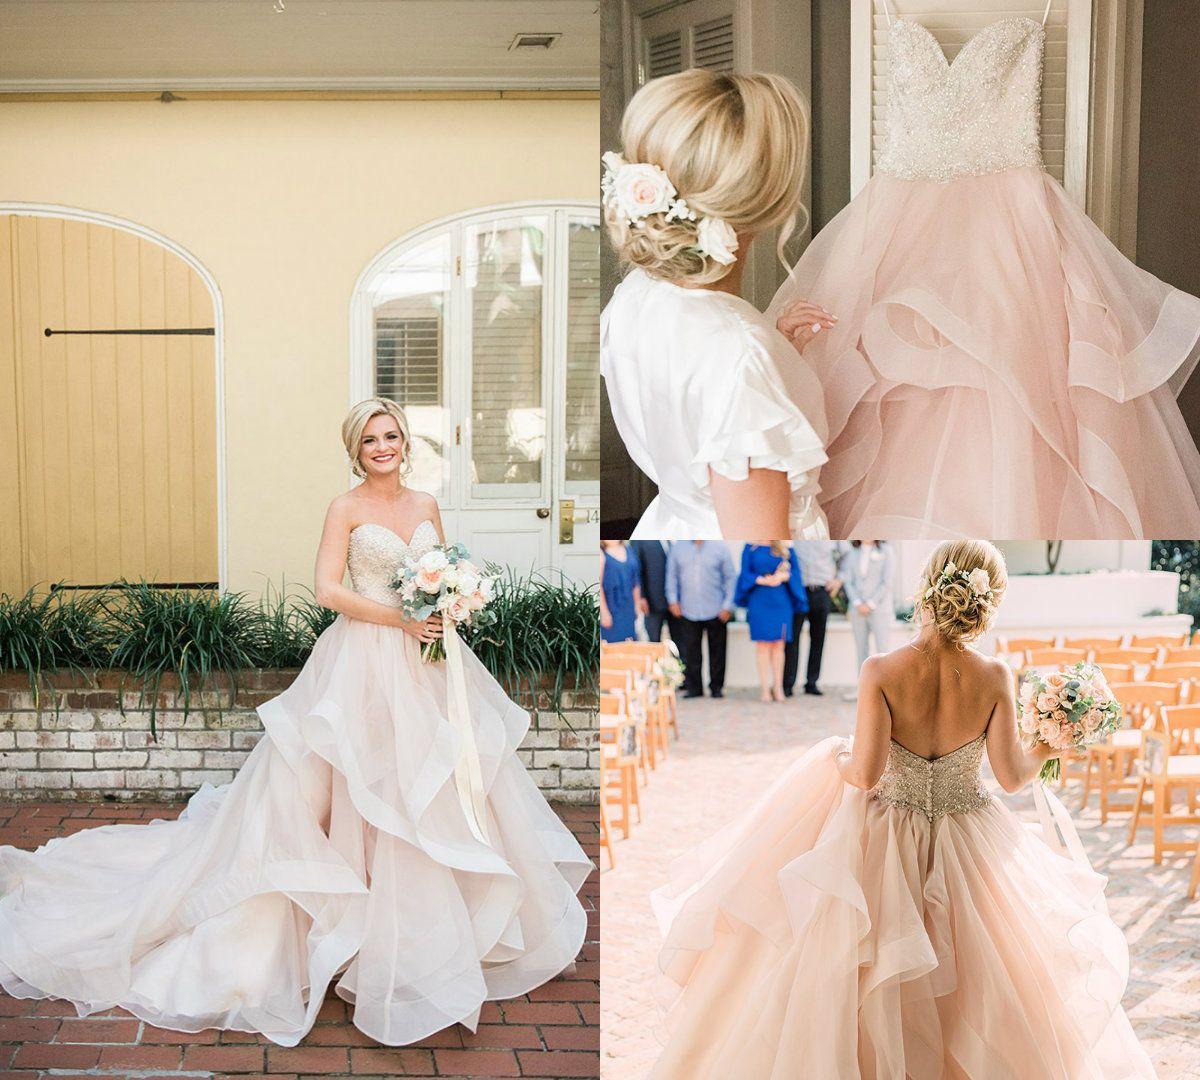 Discount 2018 Modest Country Wedding Dresses Sweetheart Beaded Ruffles Rhinestones Blush Boho Dress Sweep Train Plus Size Beach Bridal Gowns: Ruffled Country Wedding Dresses At Websimilar.org